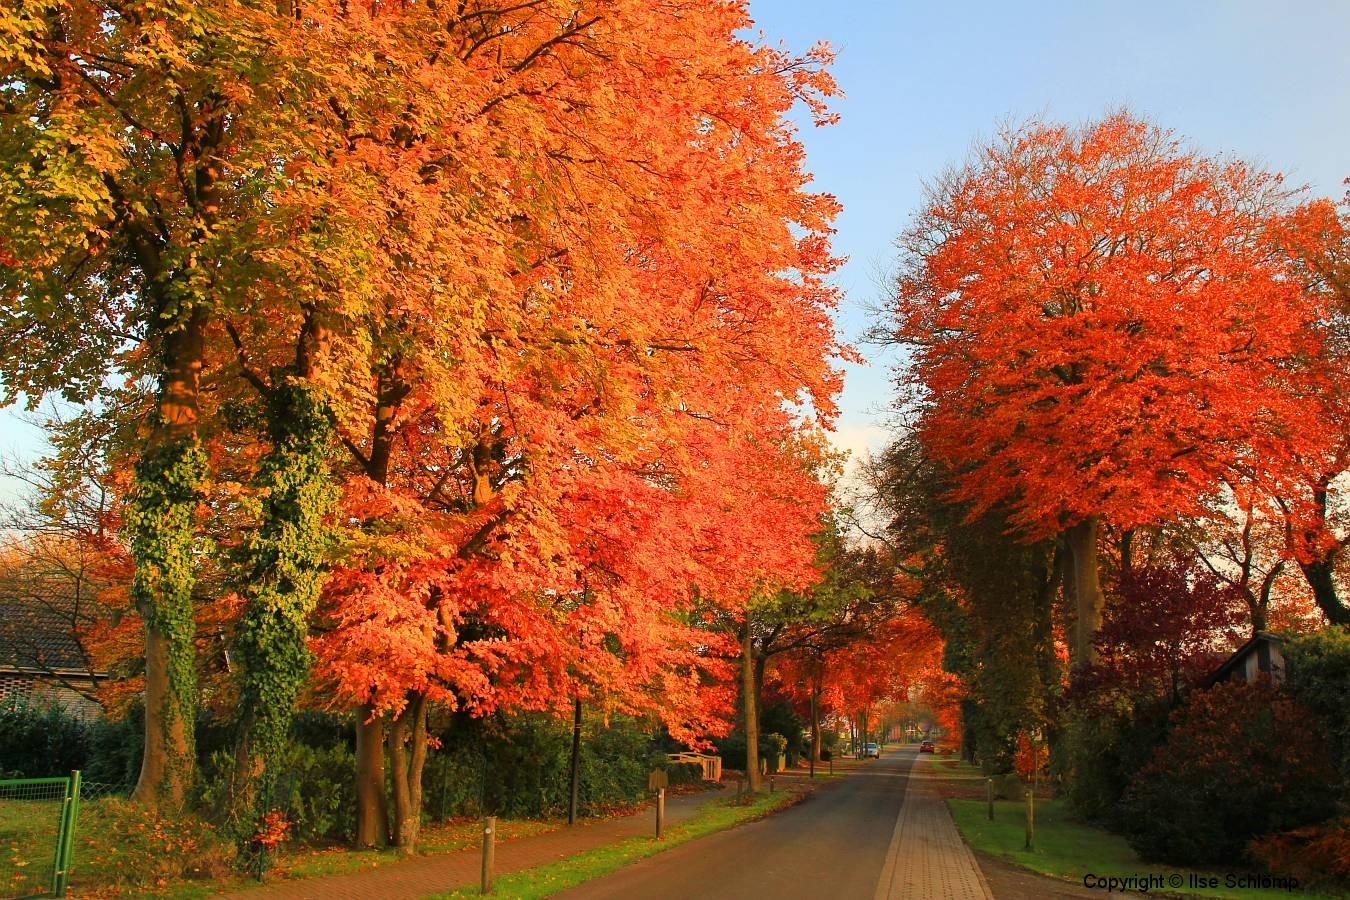 Cuxland, Stinstedt, Herbstfärbung in der Ringstraße, Herbst 2012